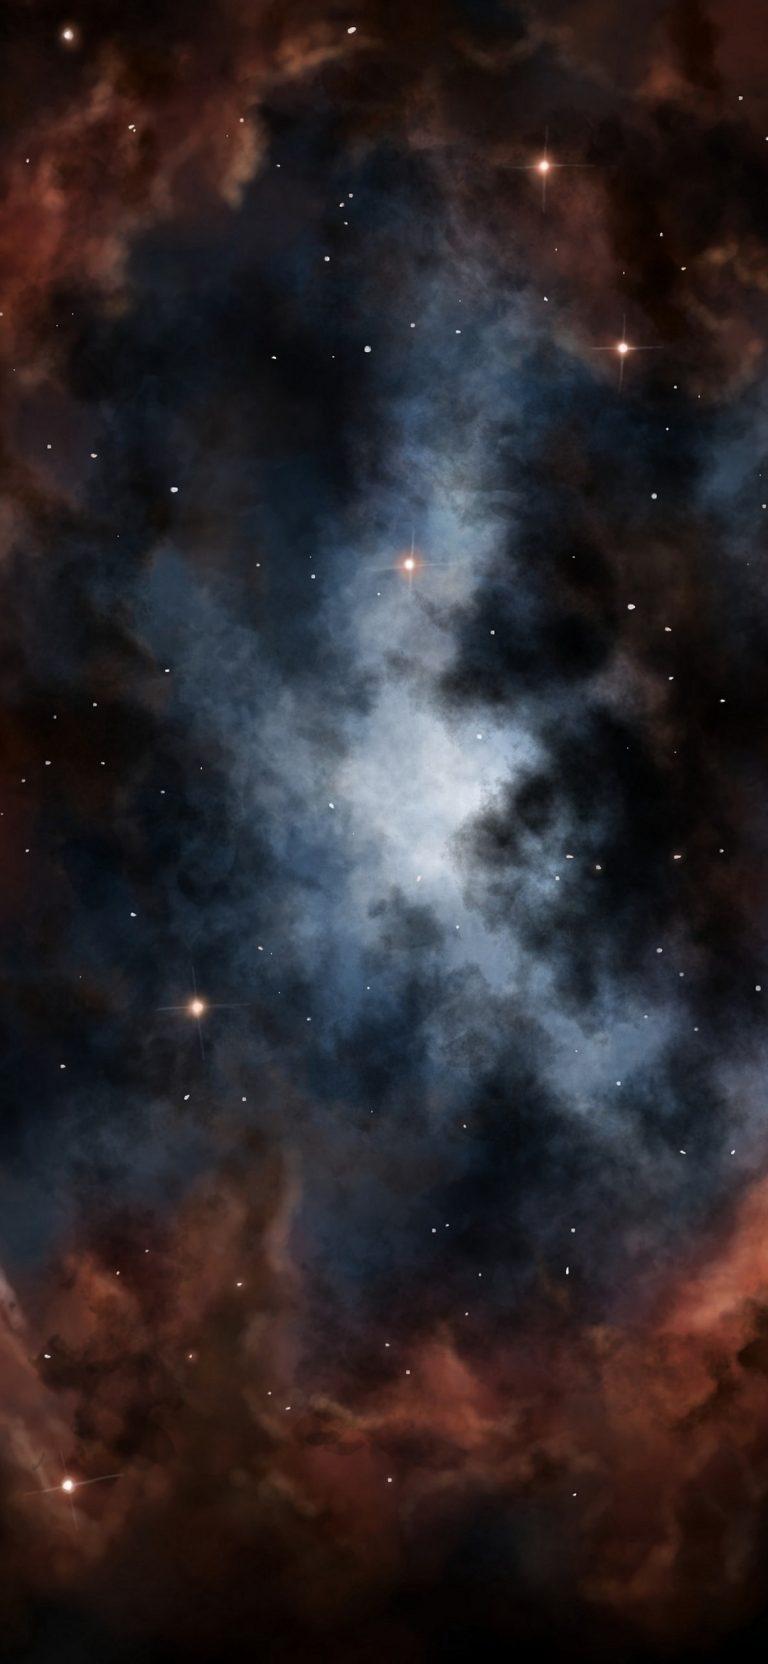 Space Phone Wallpaper 053 1080x2340 768x1664